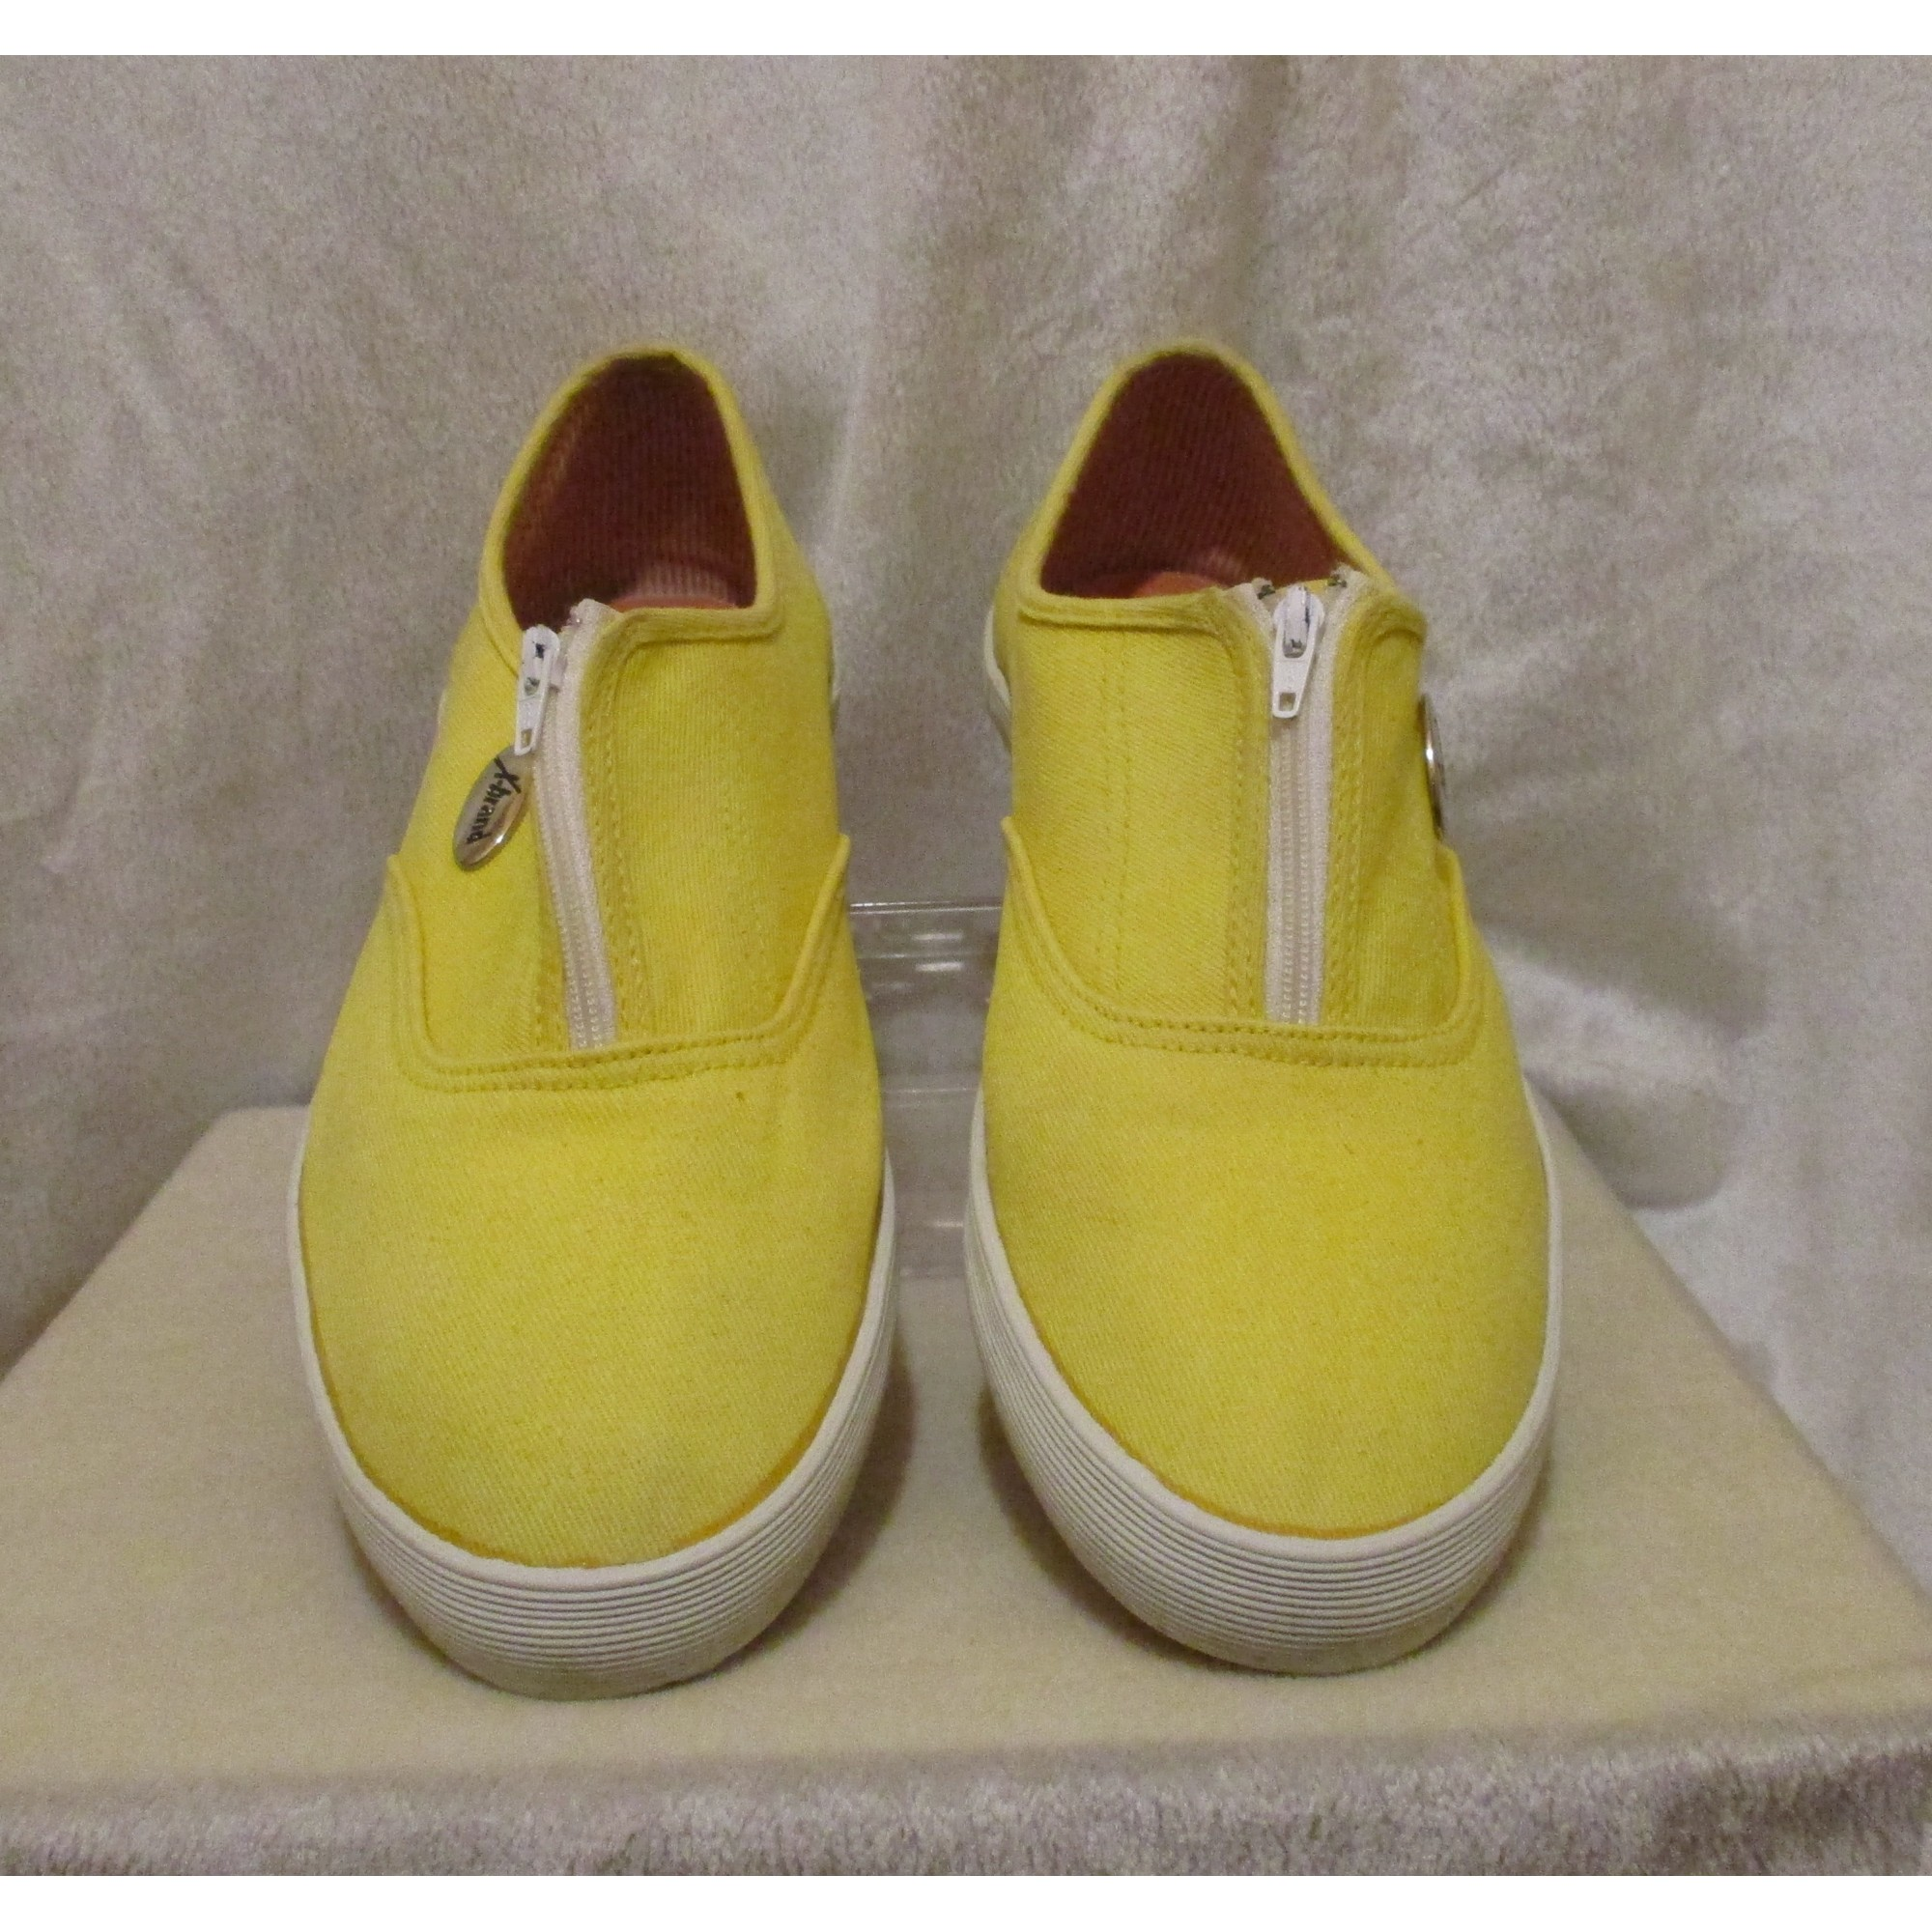 Chaussures de sport X BRAND Jaune